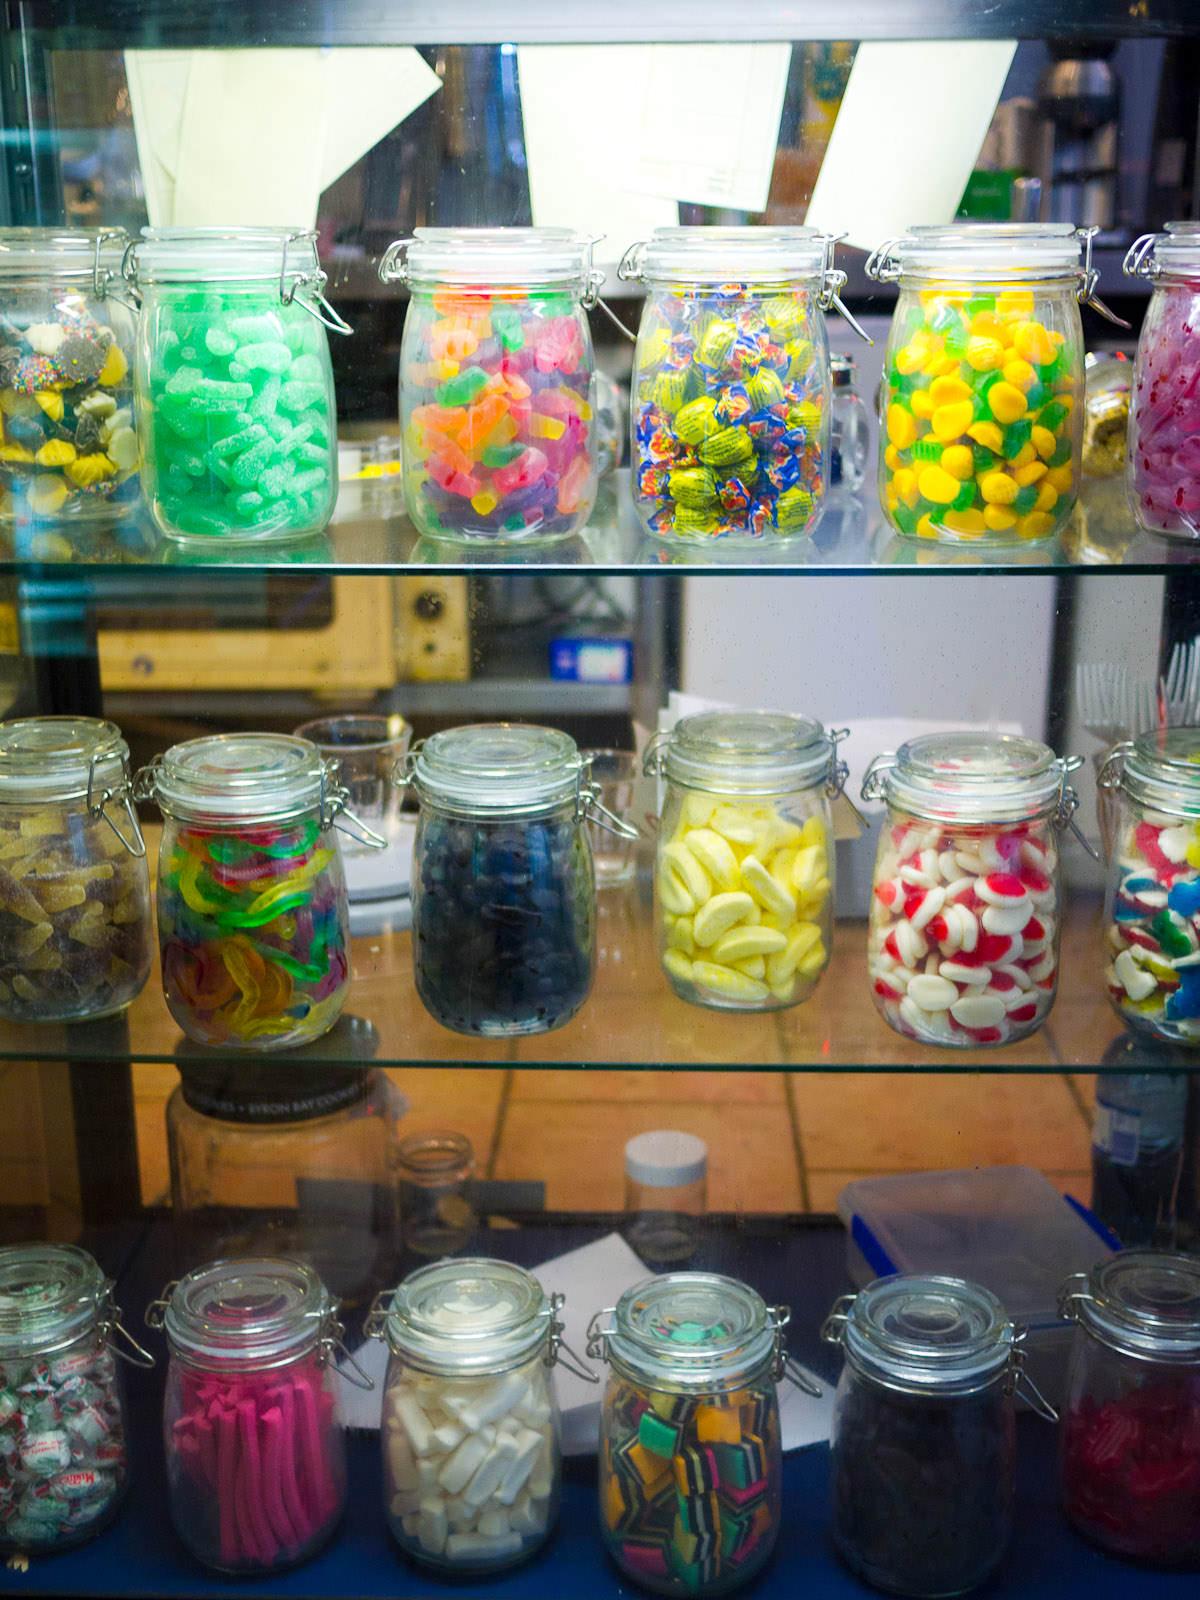 Lolly jars